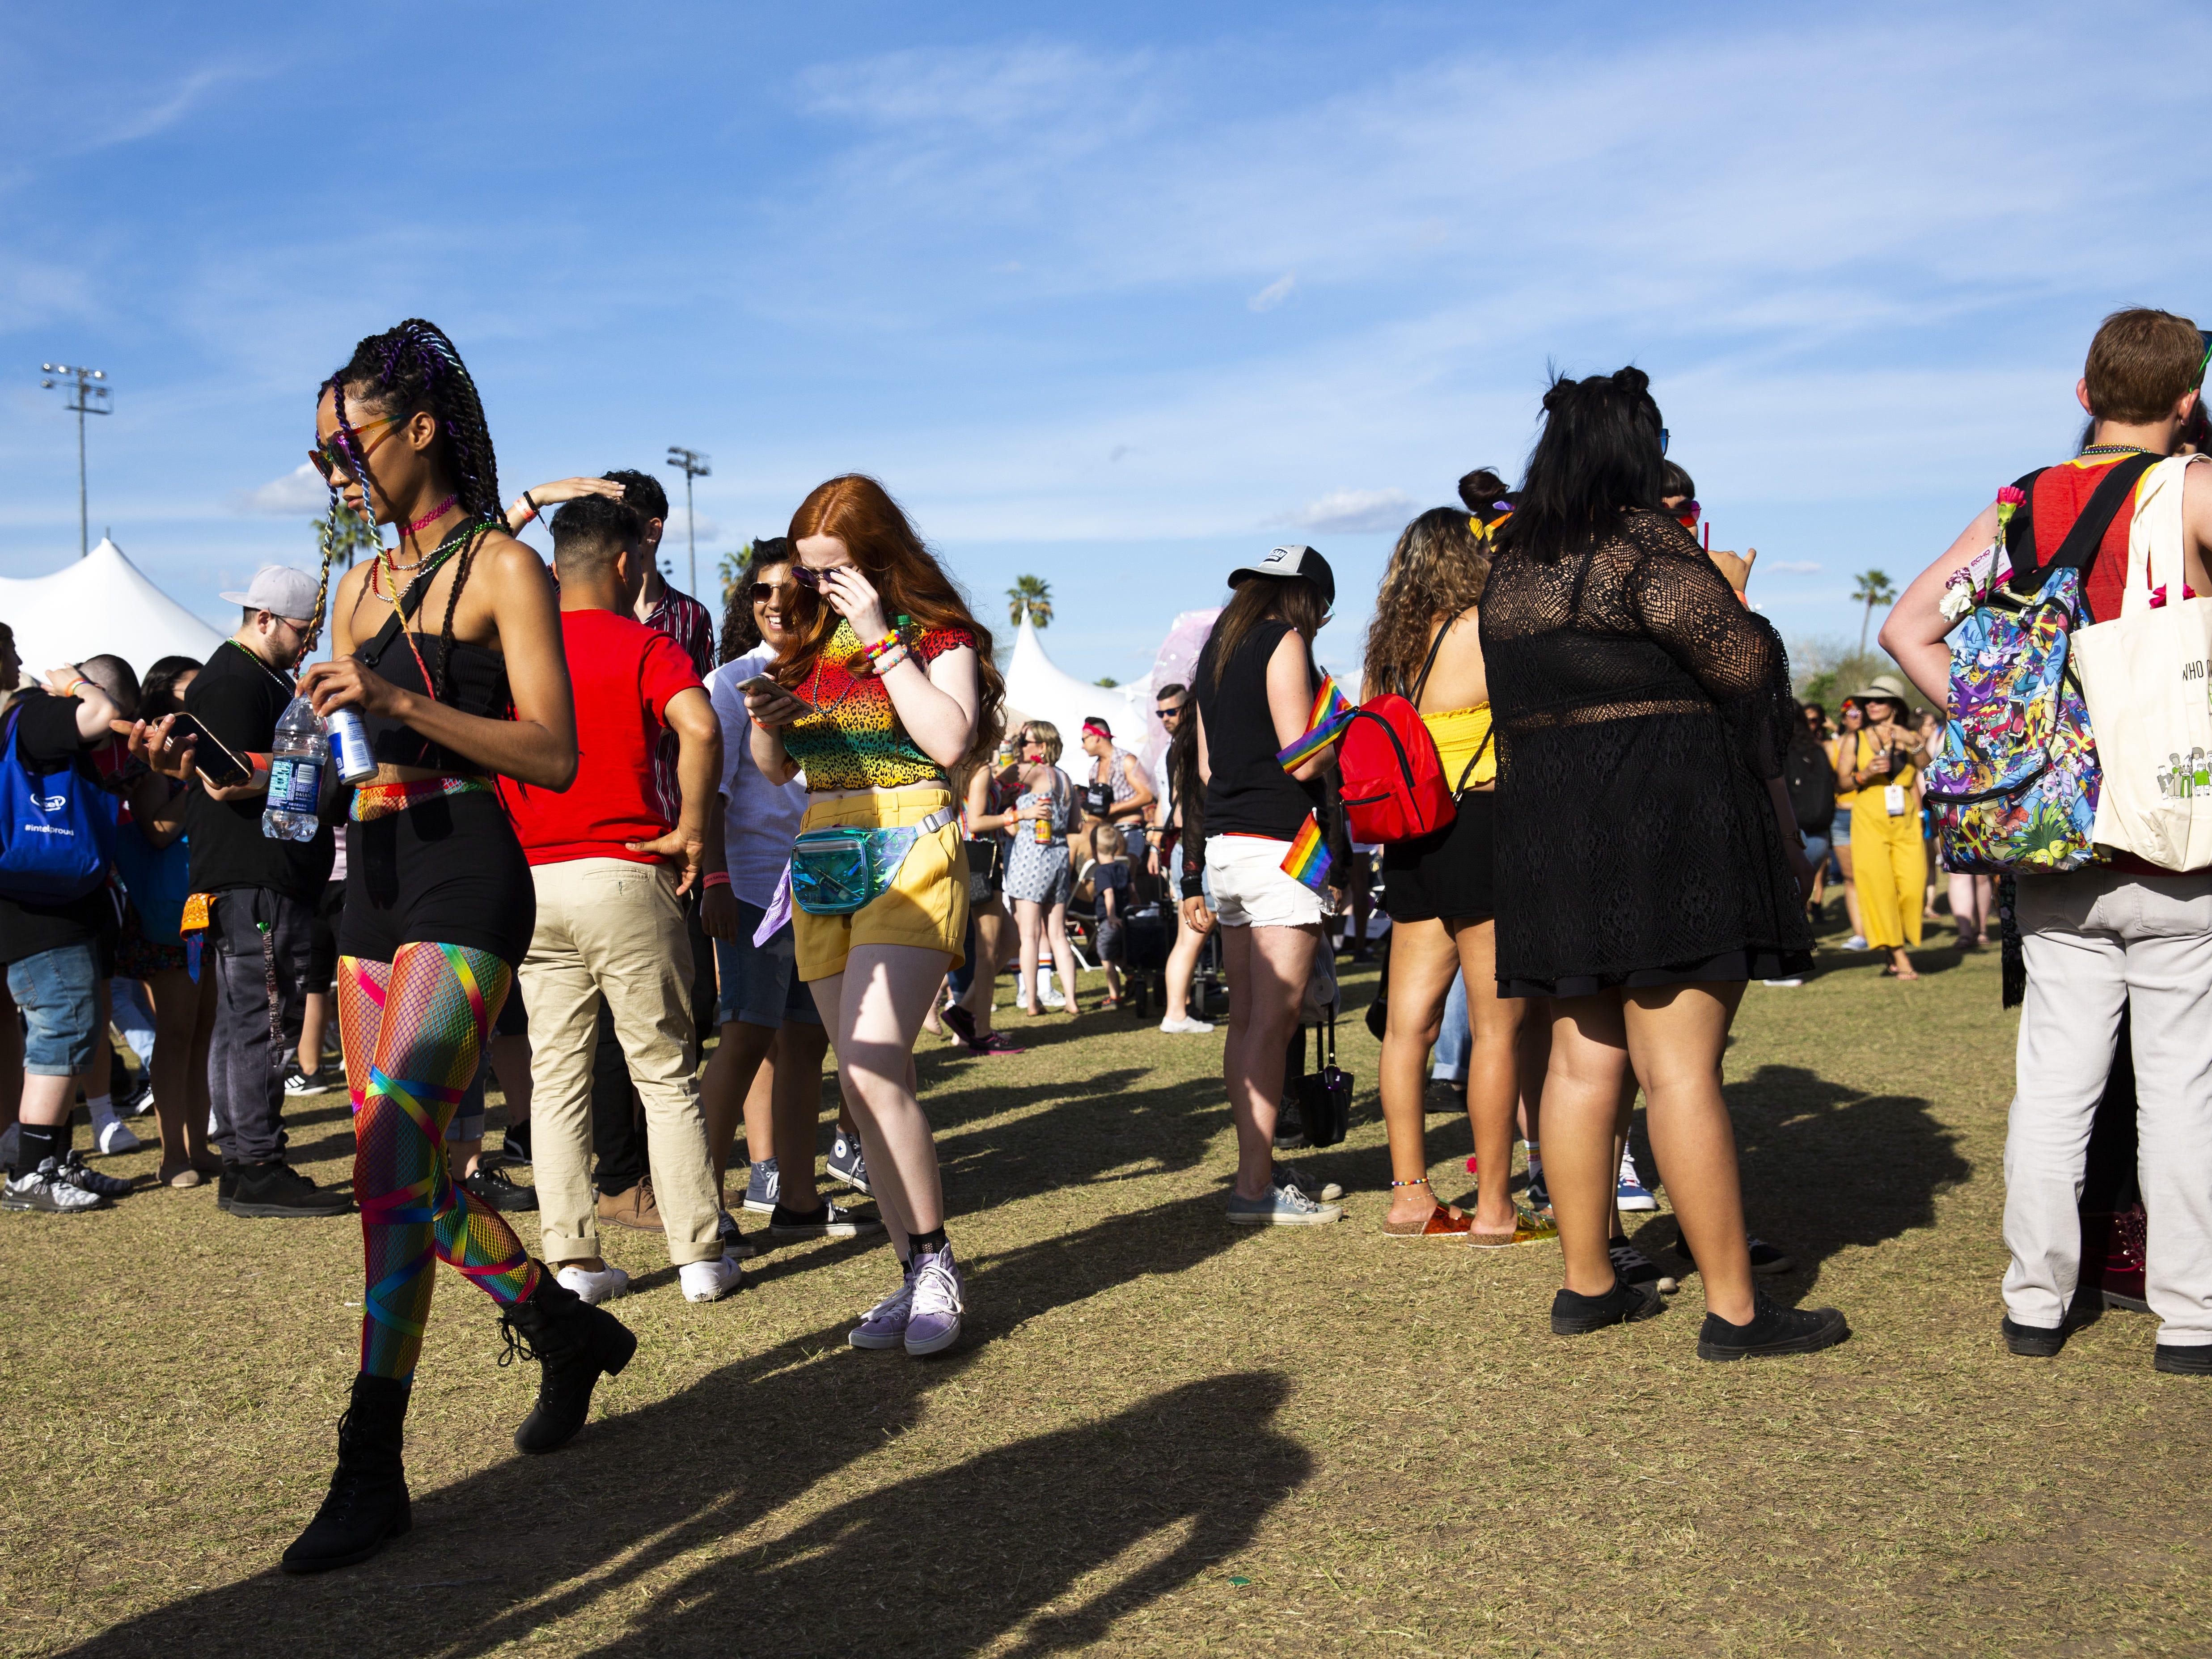 People wait in line to buy food during Phoenix Pride at Steele Indian School Park on Saturday, April 6, 2019.